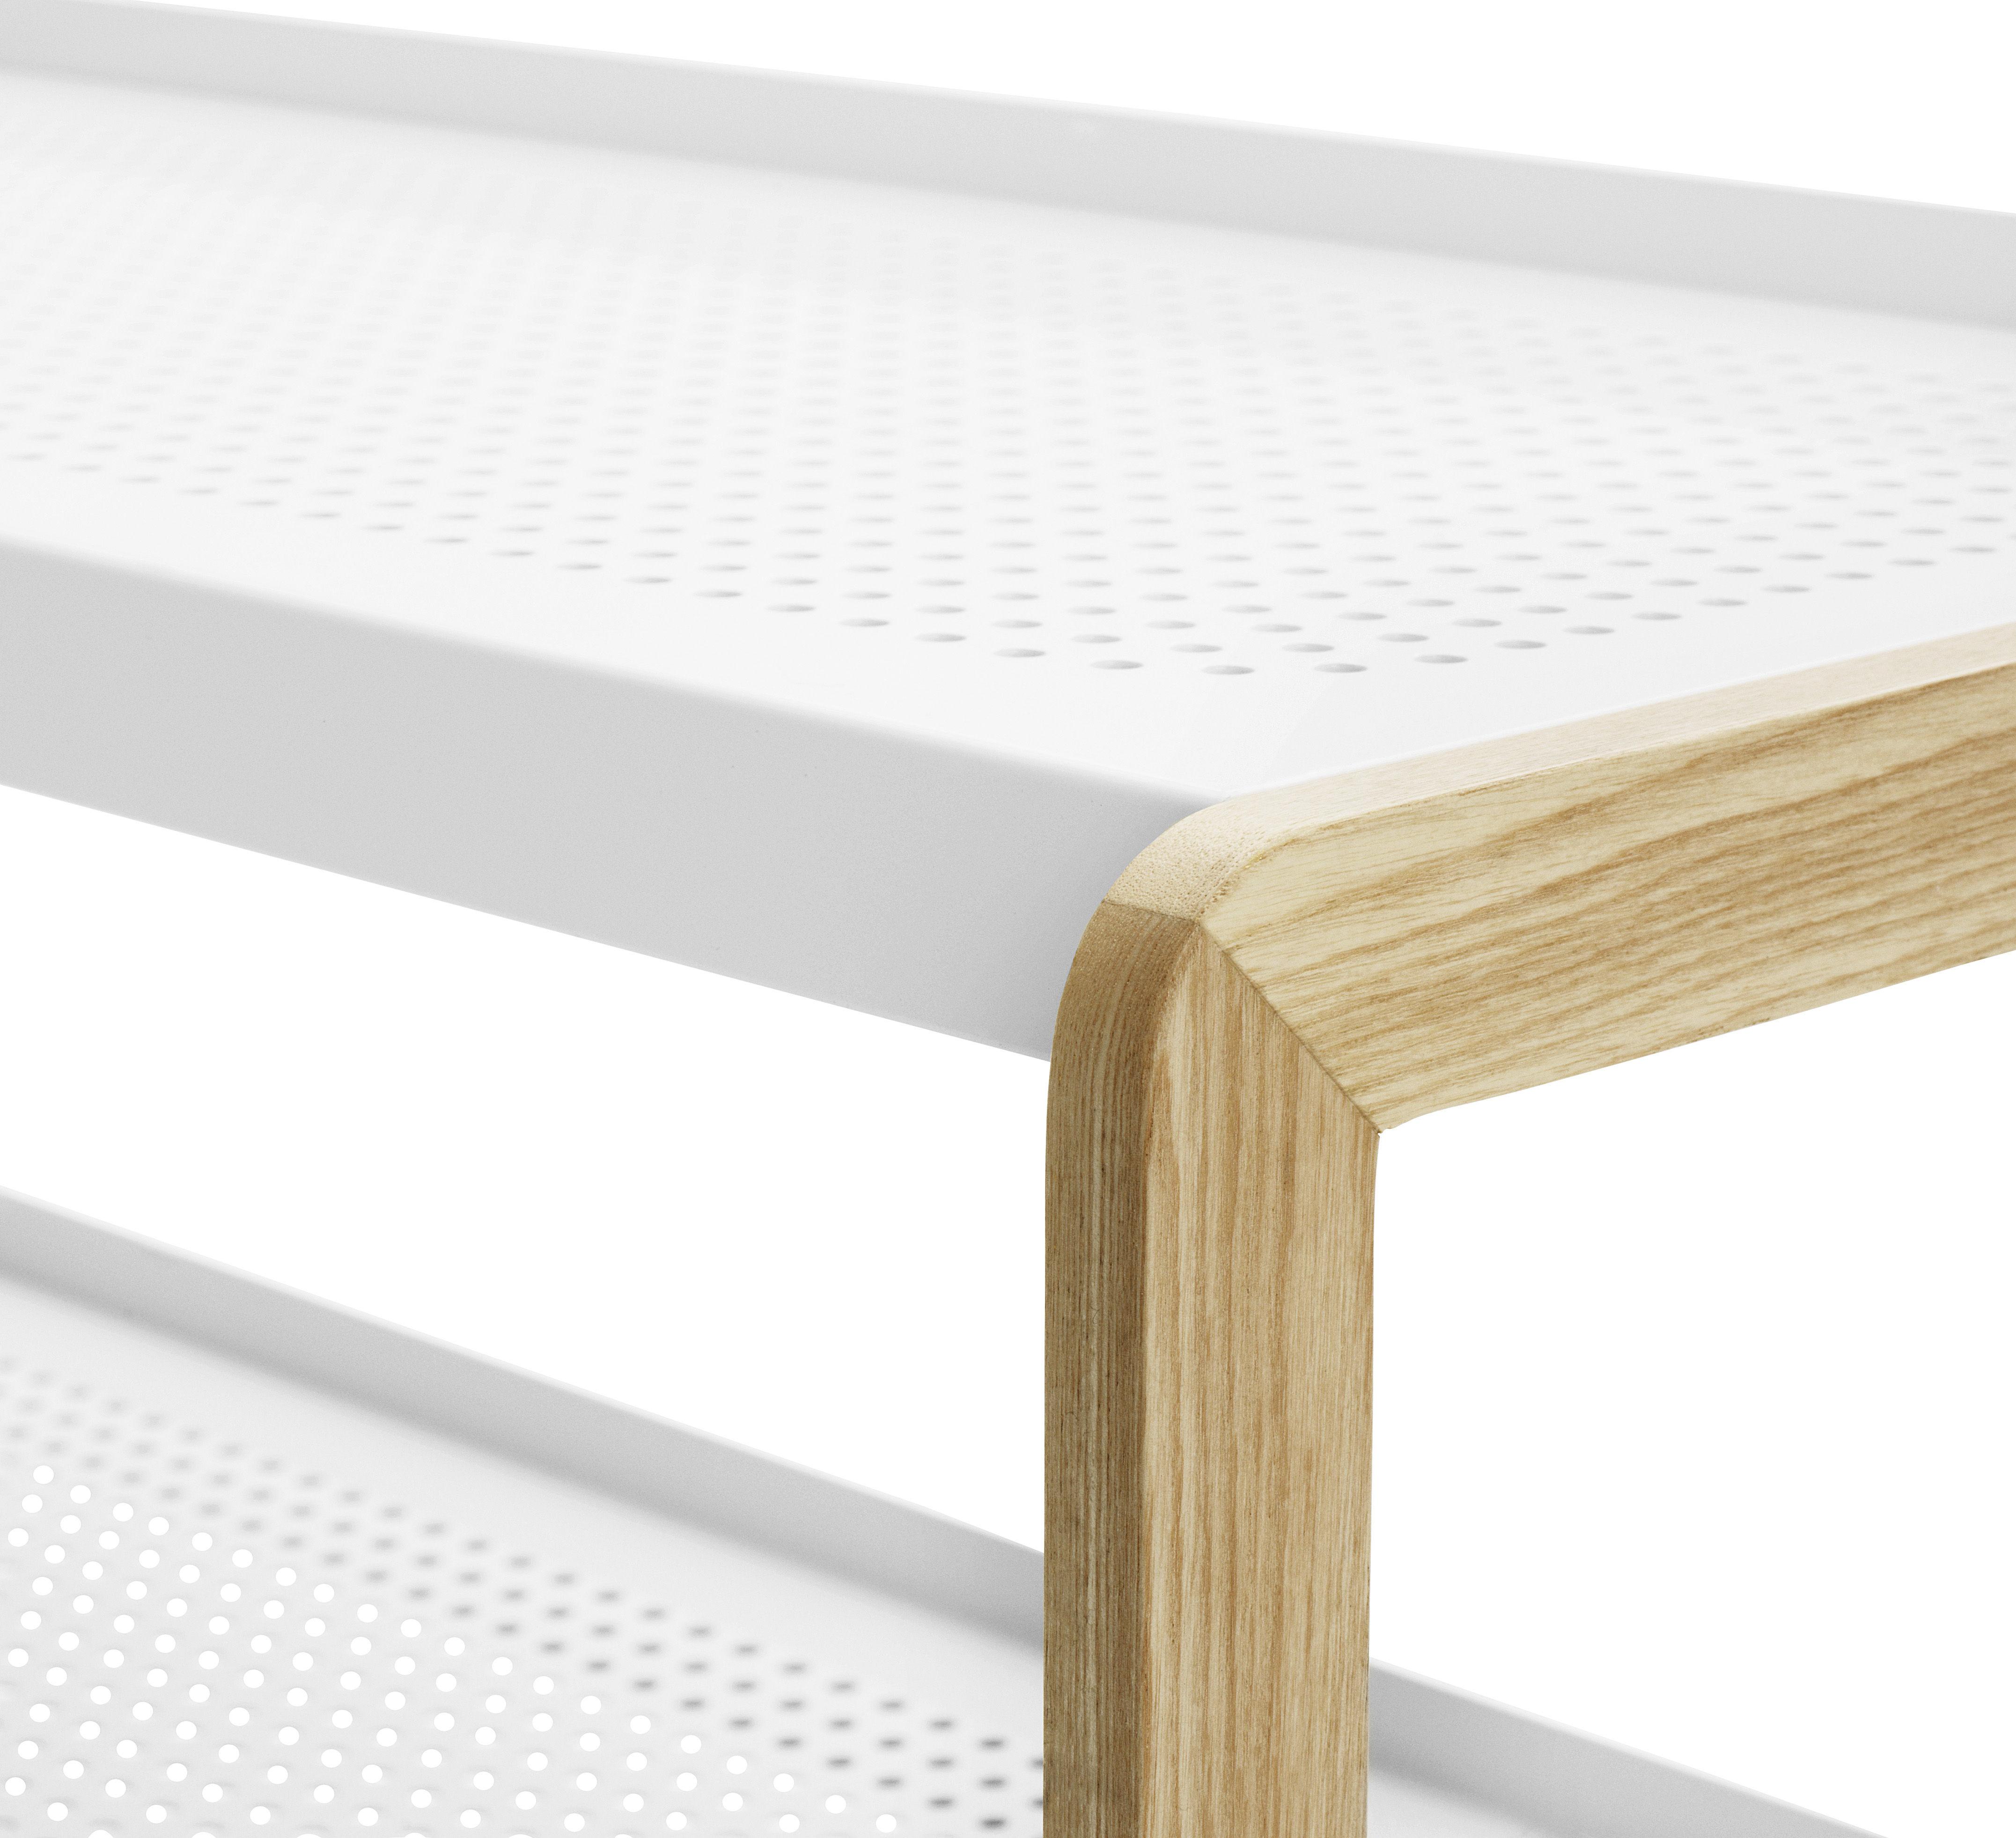 ee54a463787 ... Furniture - Shelves & Storage Furniture - Sko Shoe rack by Normann  Copenhagen - White -